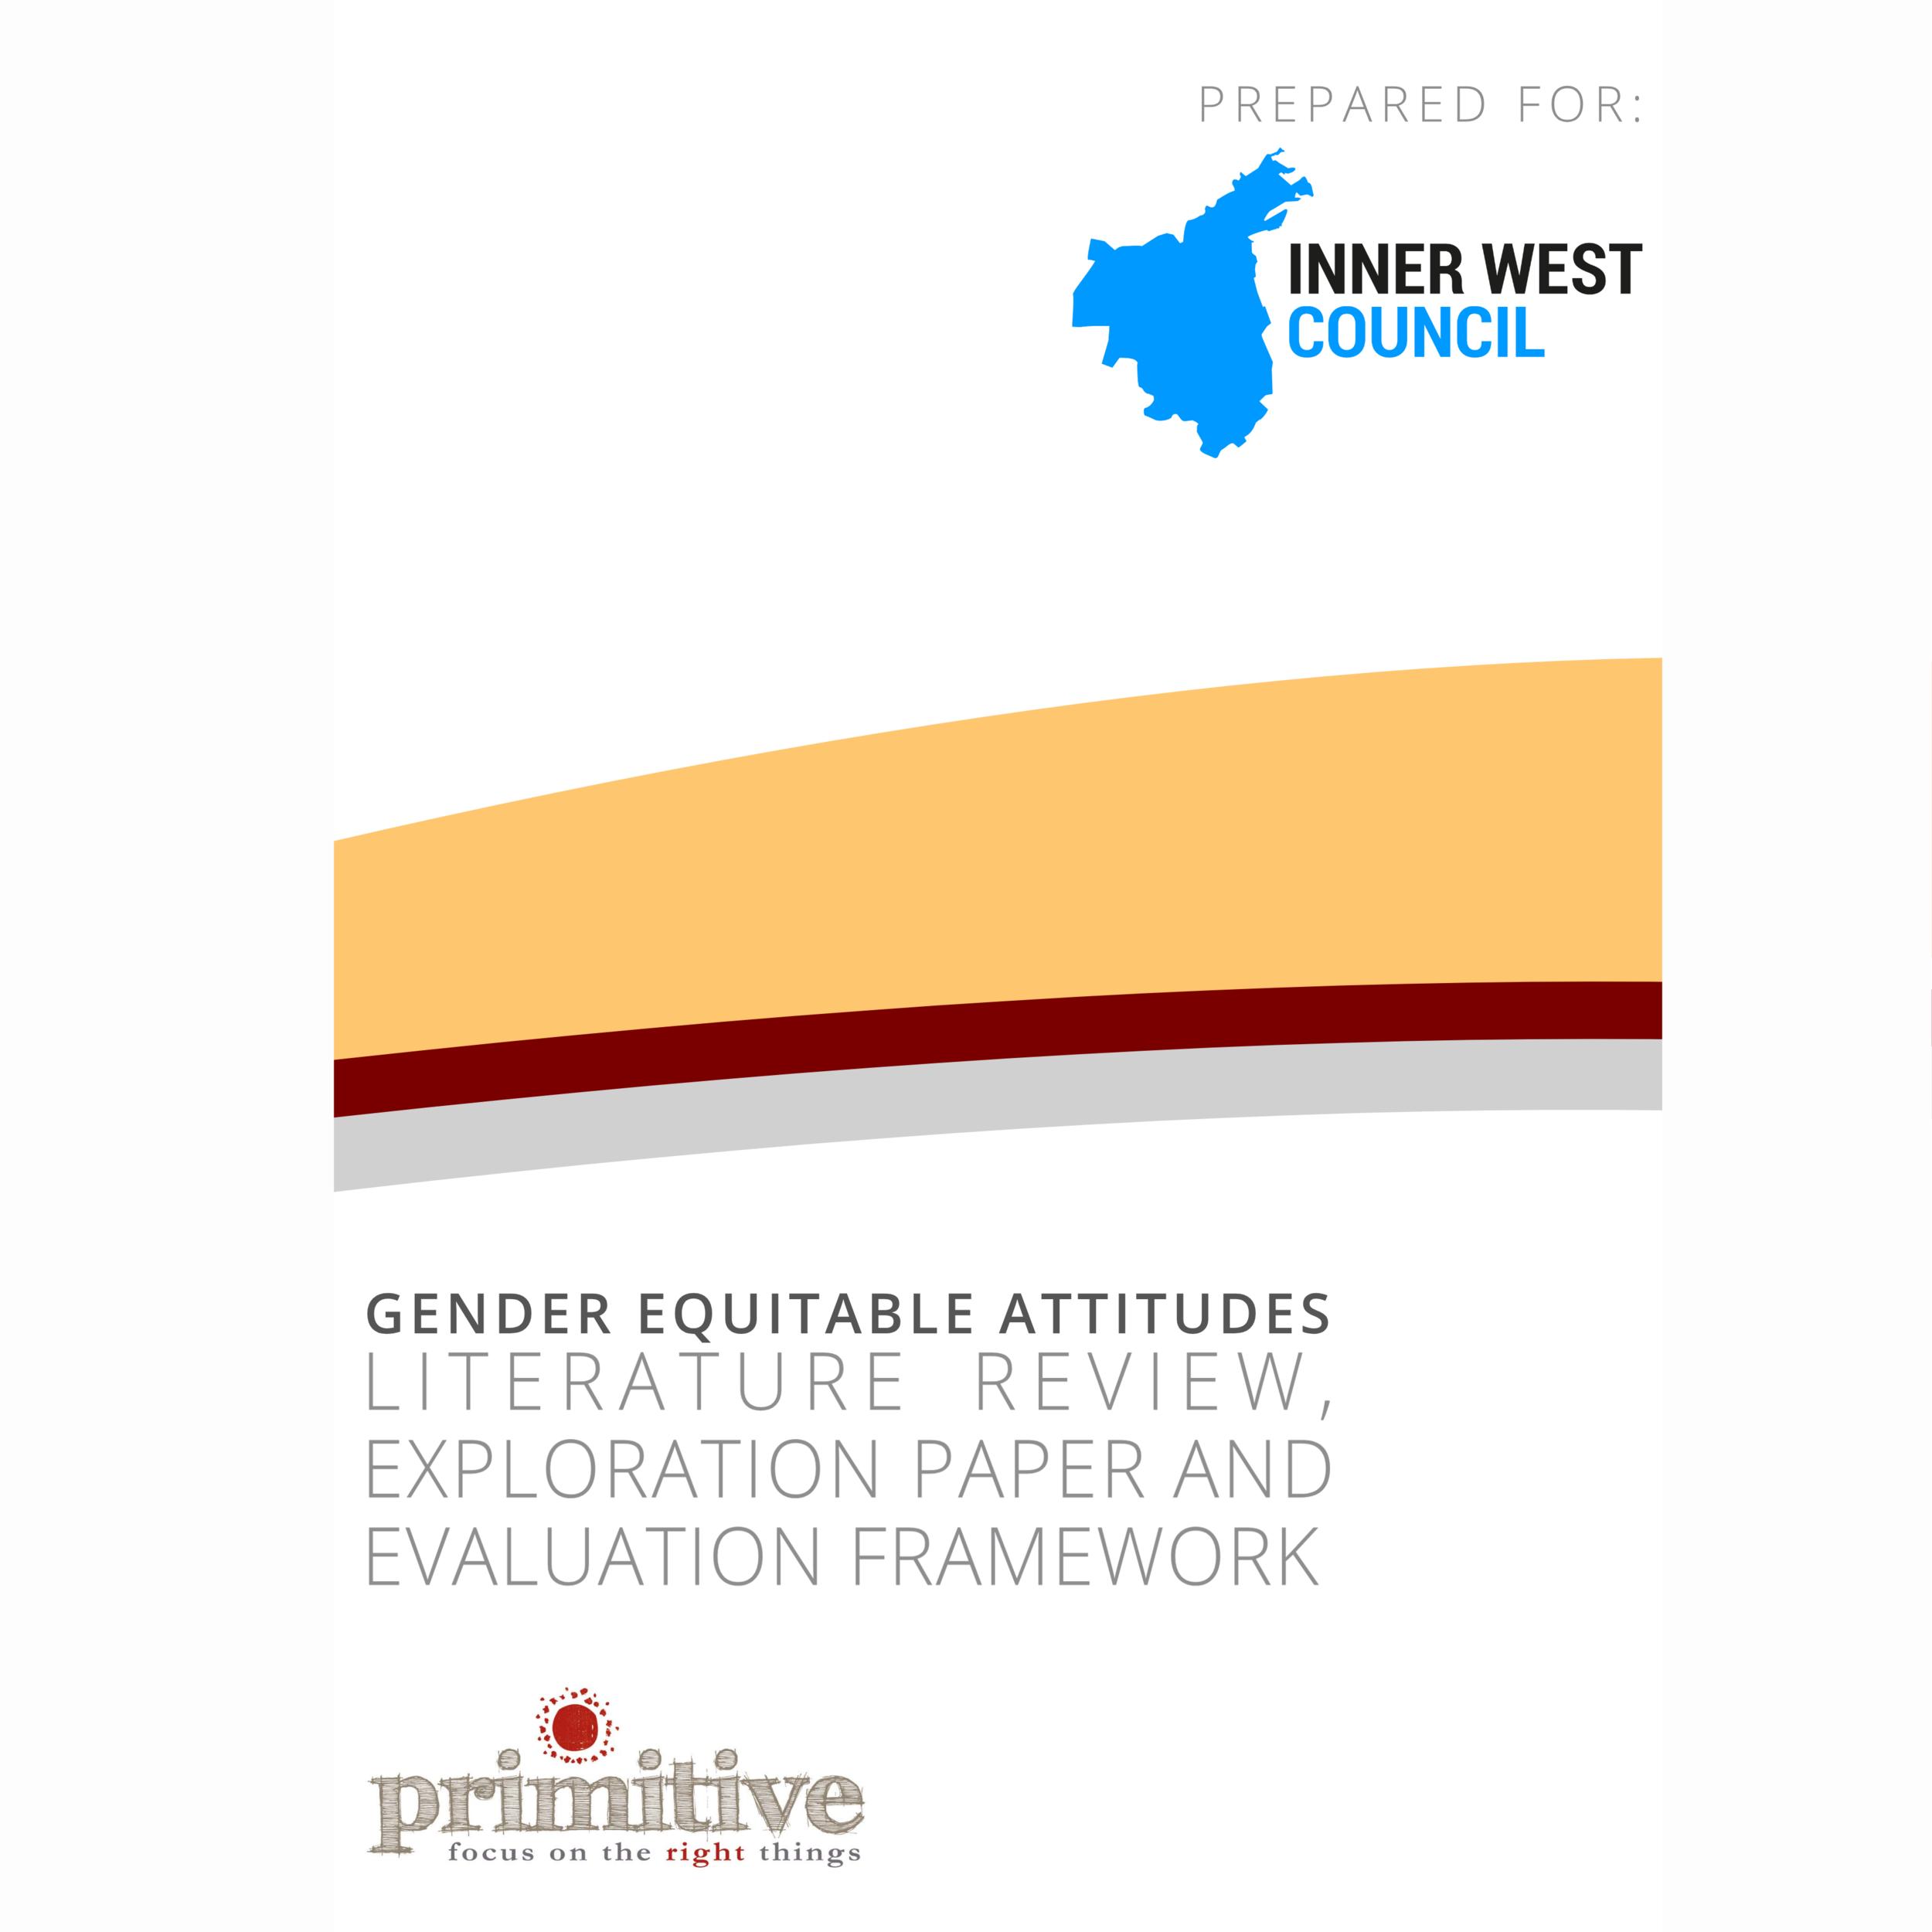 Gender attitude change: literature review and evaluation framework